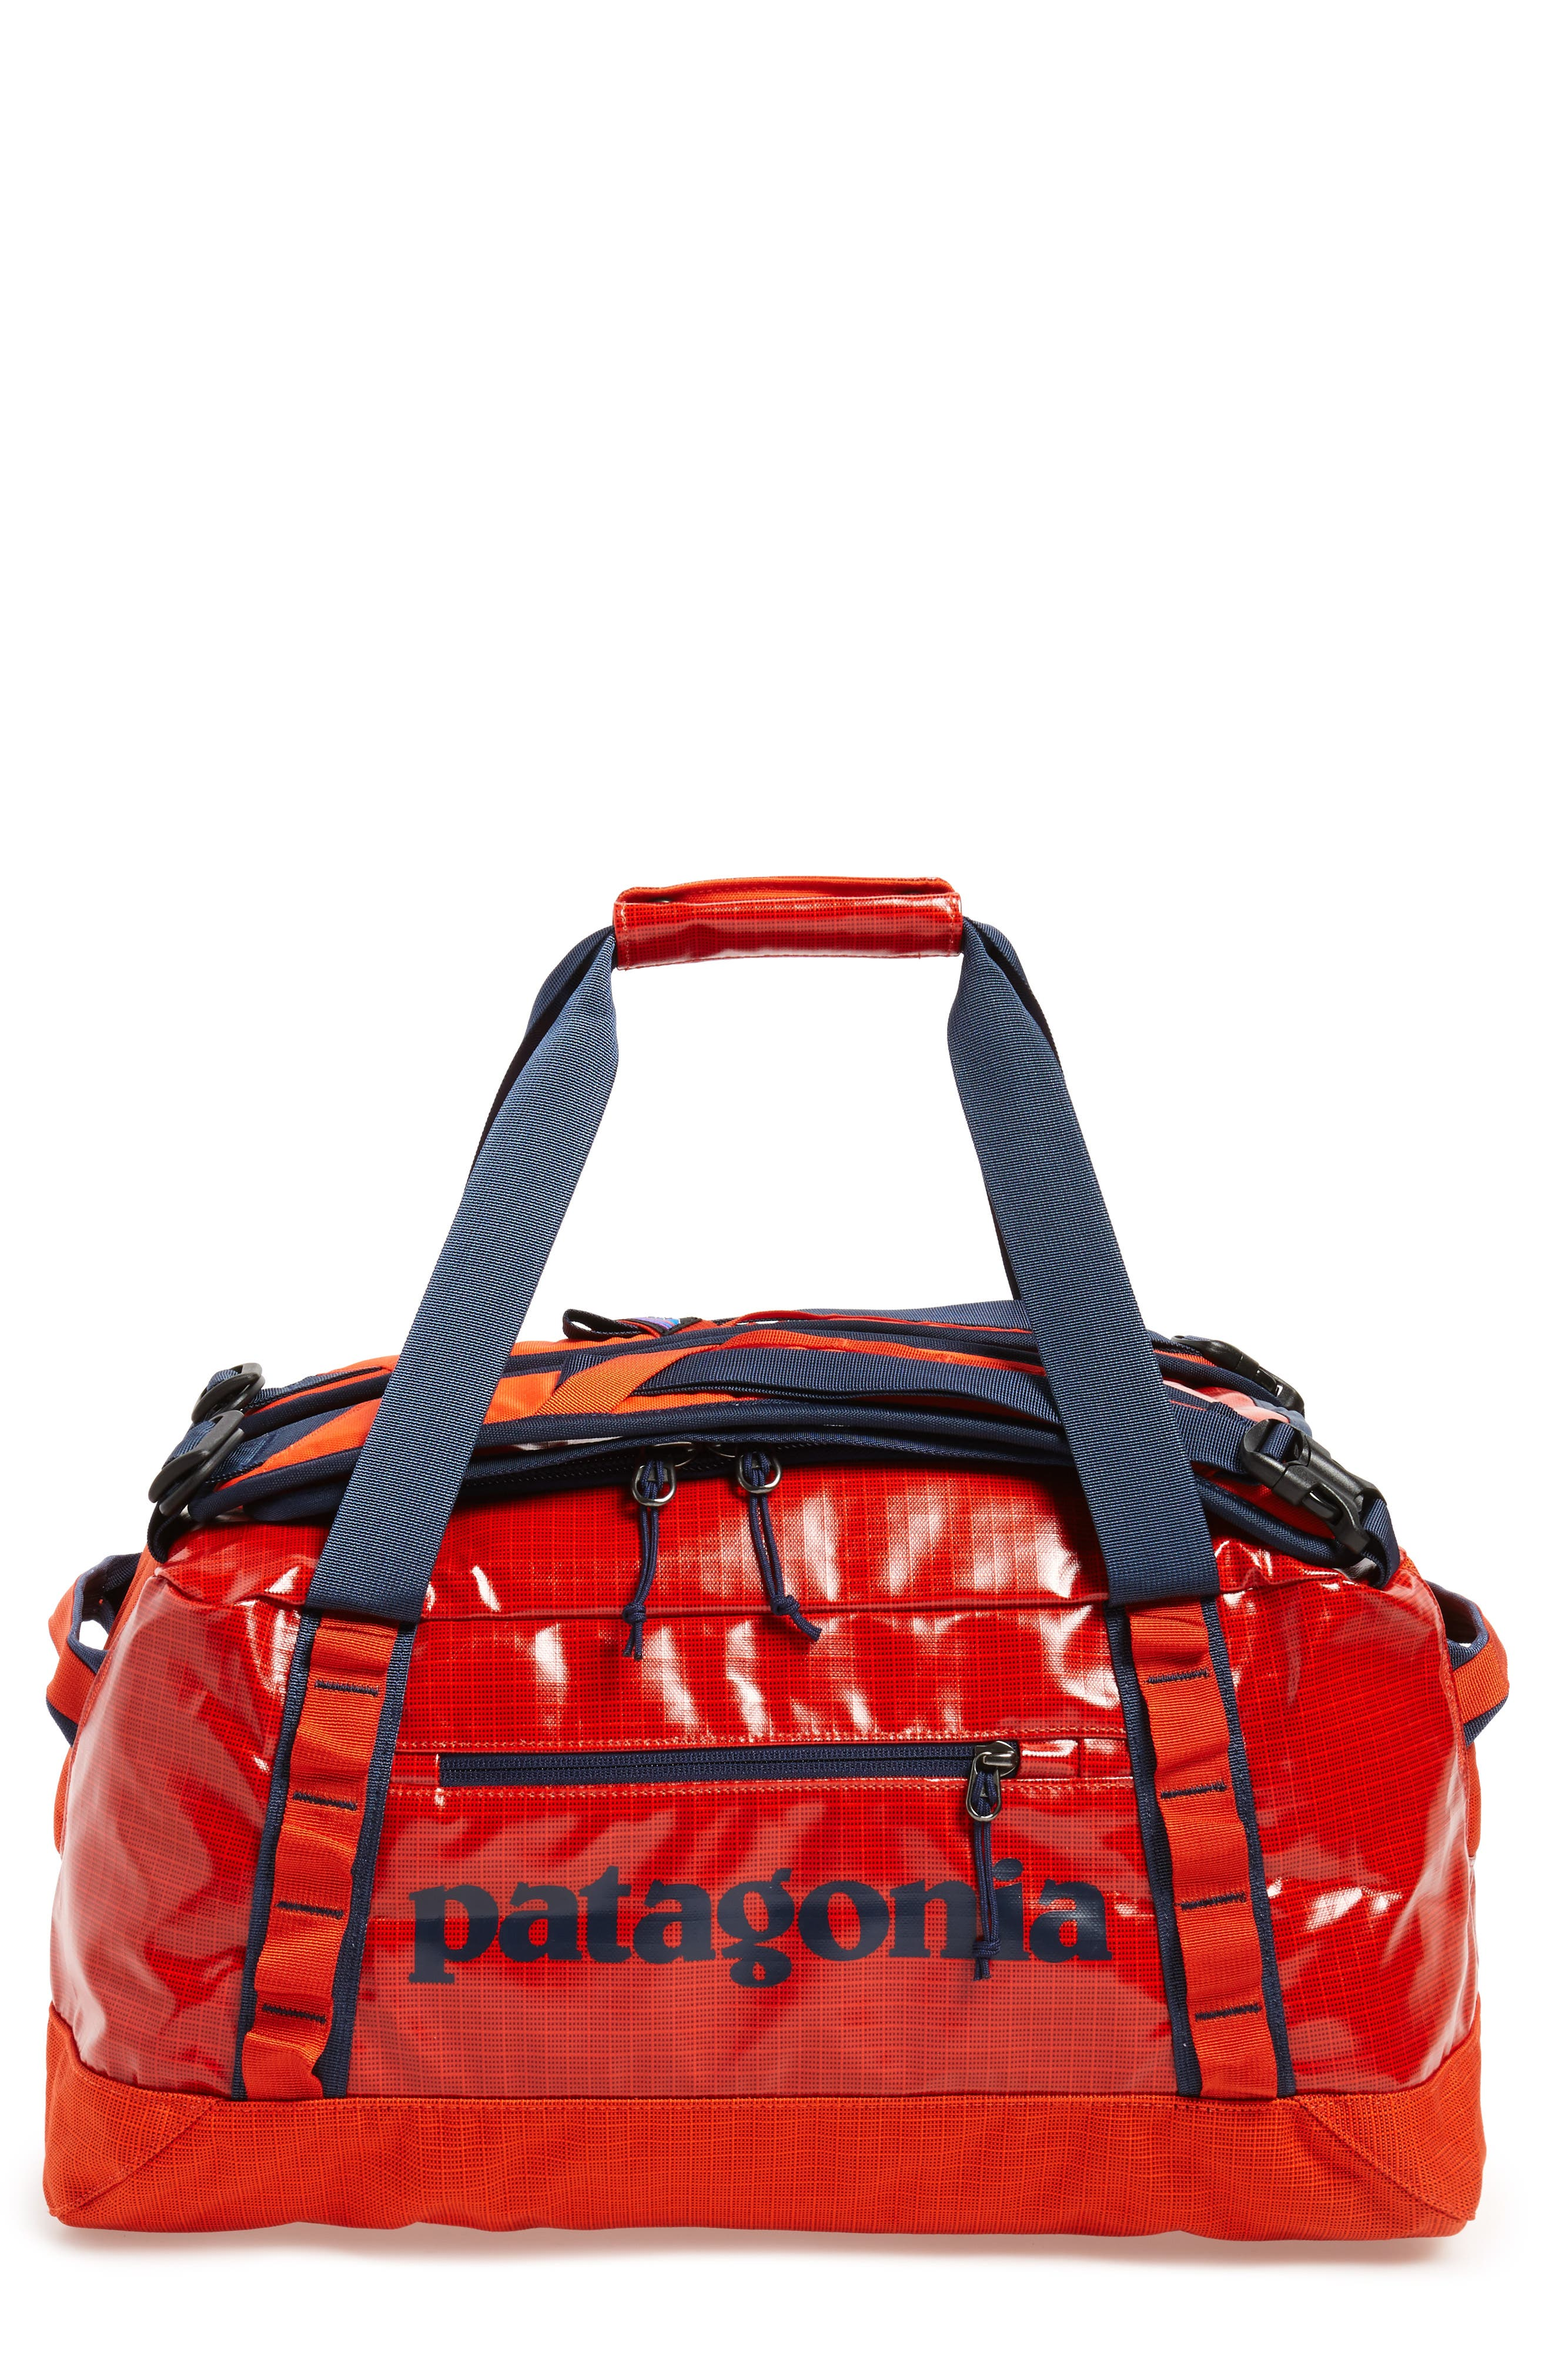 ,                             Black Hole Water Repellent 45-Liter Duffle Bag,                             Main thumbnail 59, color,                             600